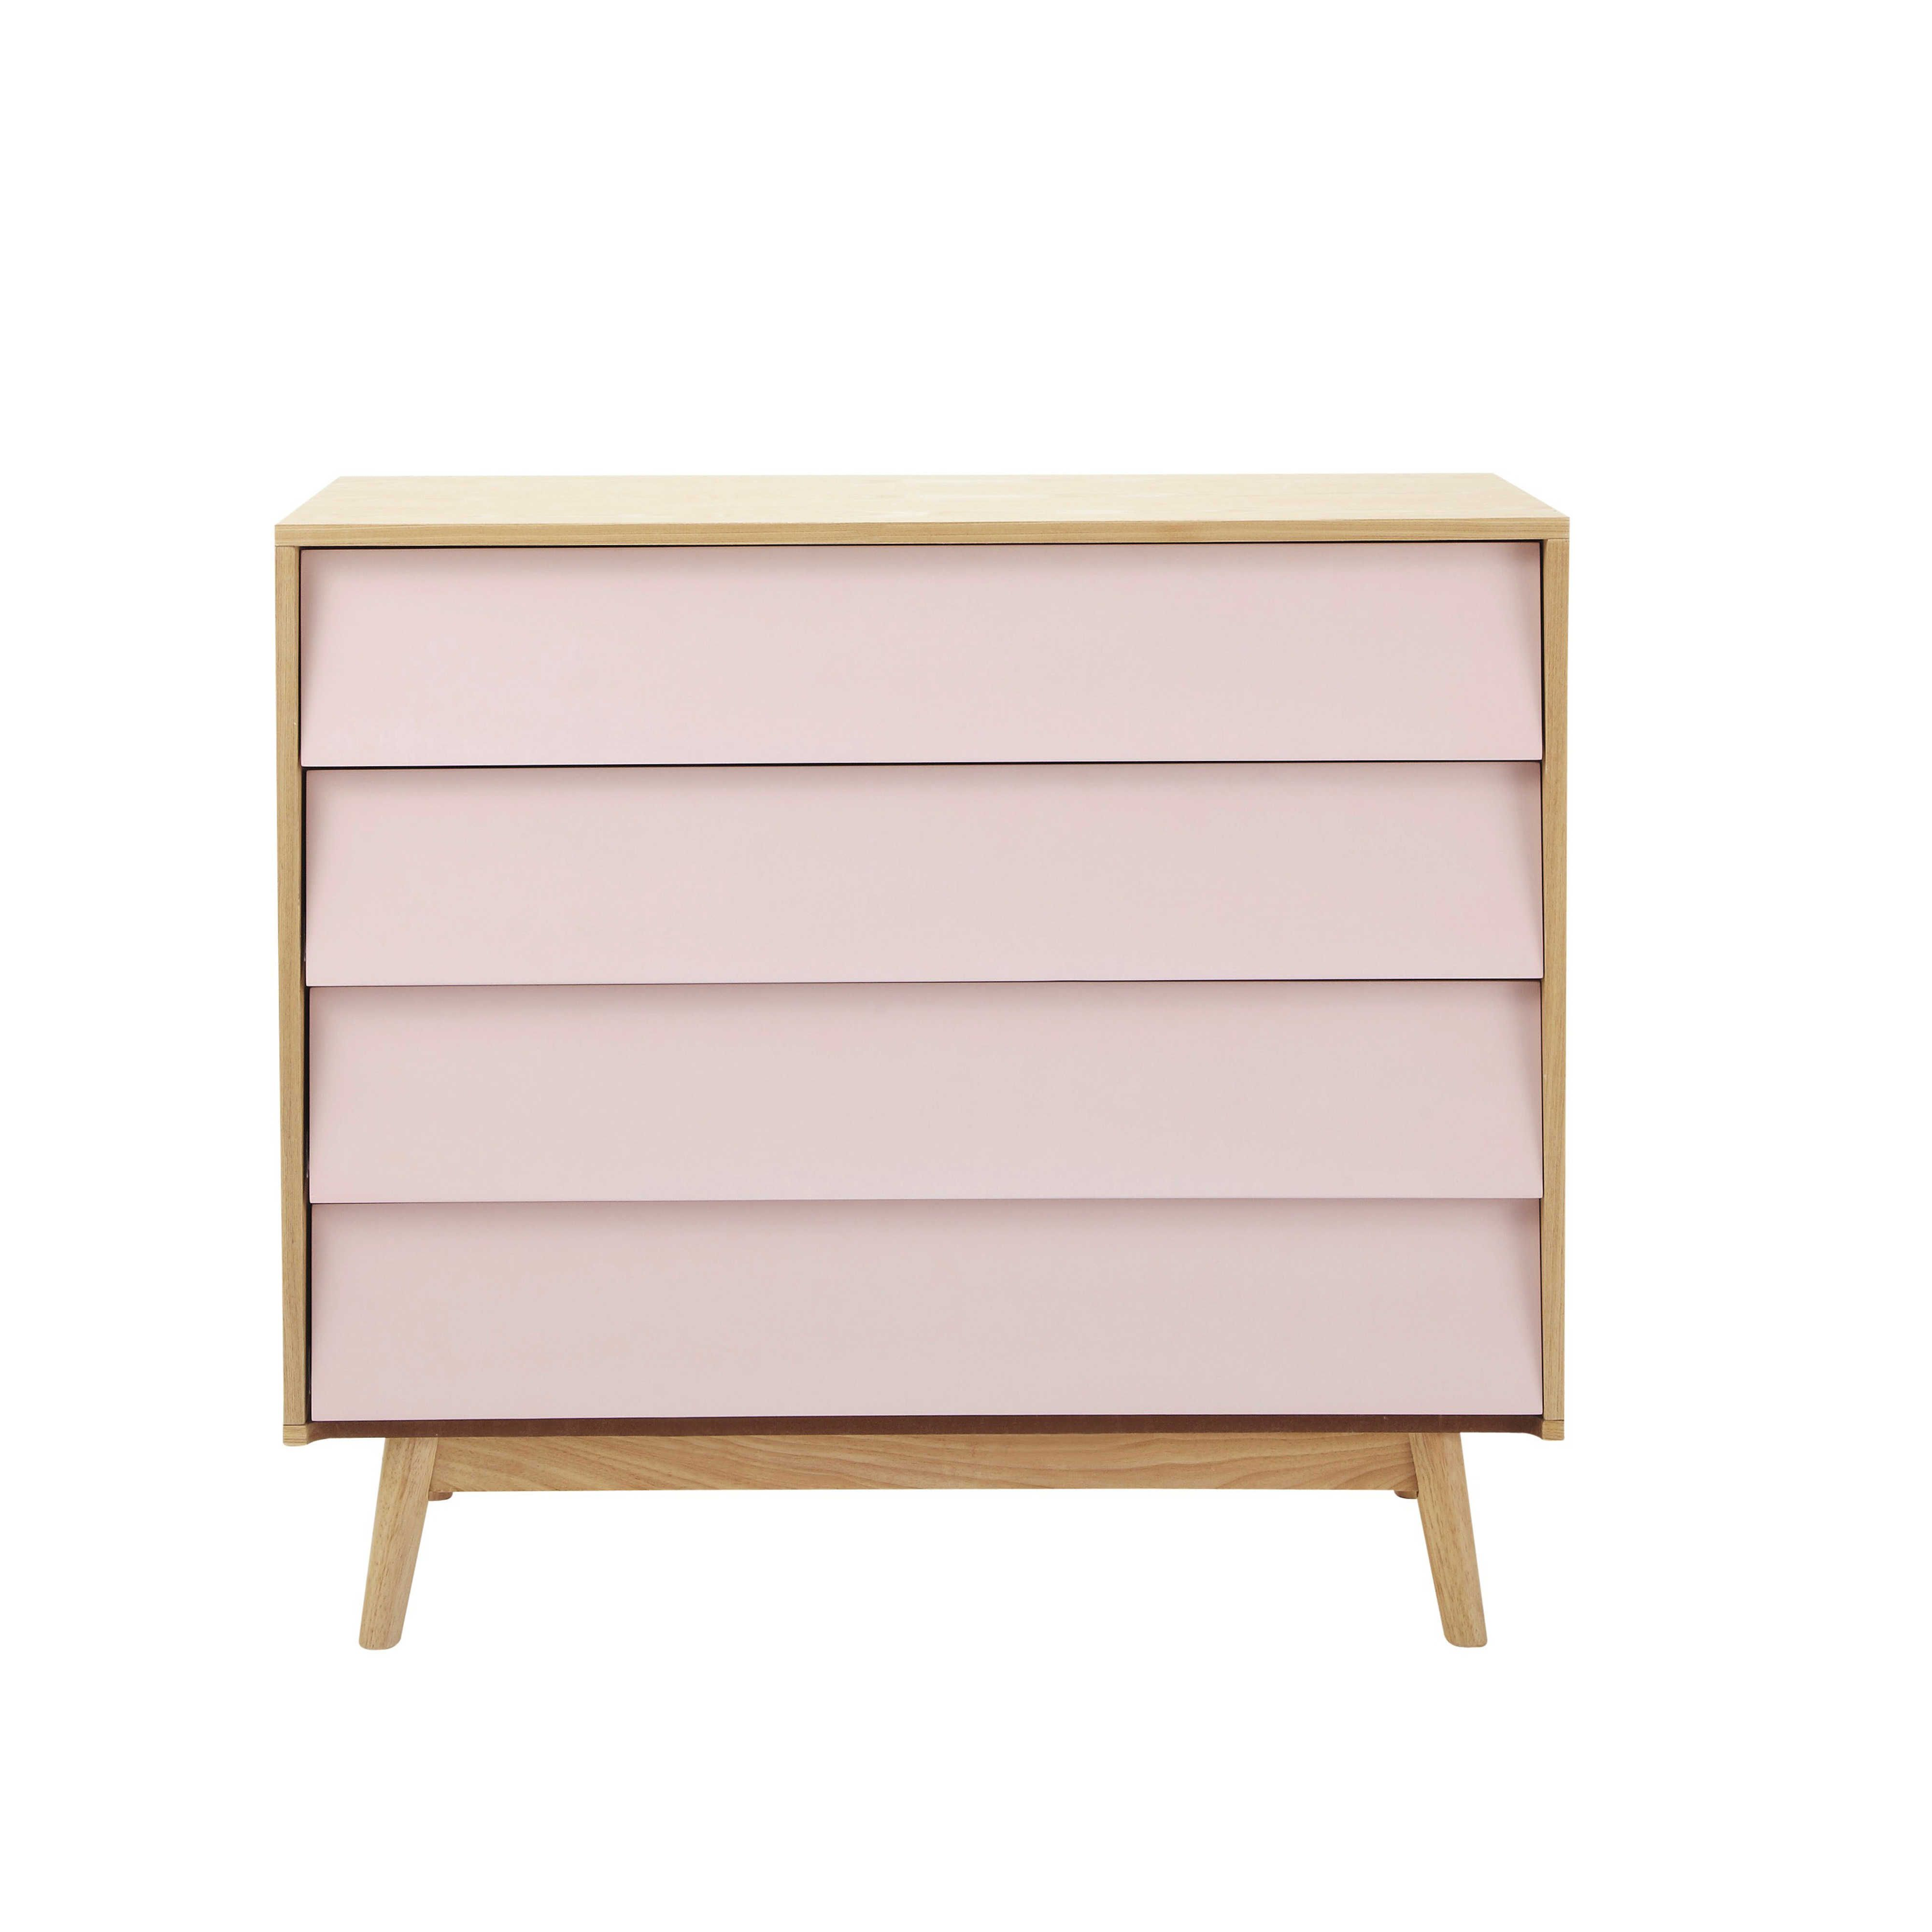 Comoda Vintage De Madera Rosa An 90 Cm Fjord Maisons Du Monde Dresser Decor Furniture